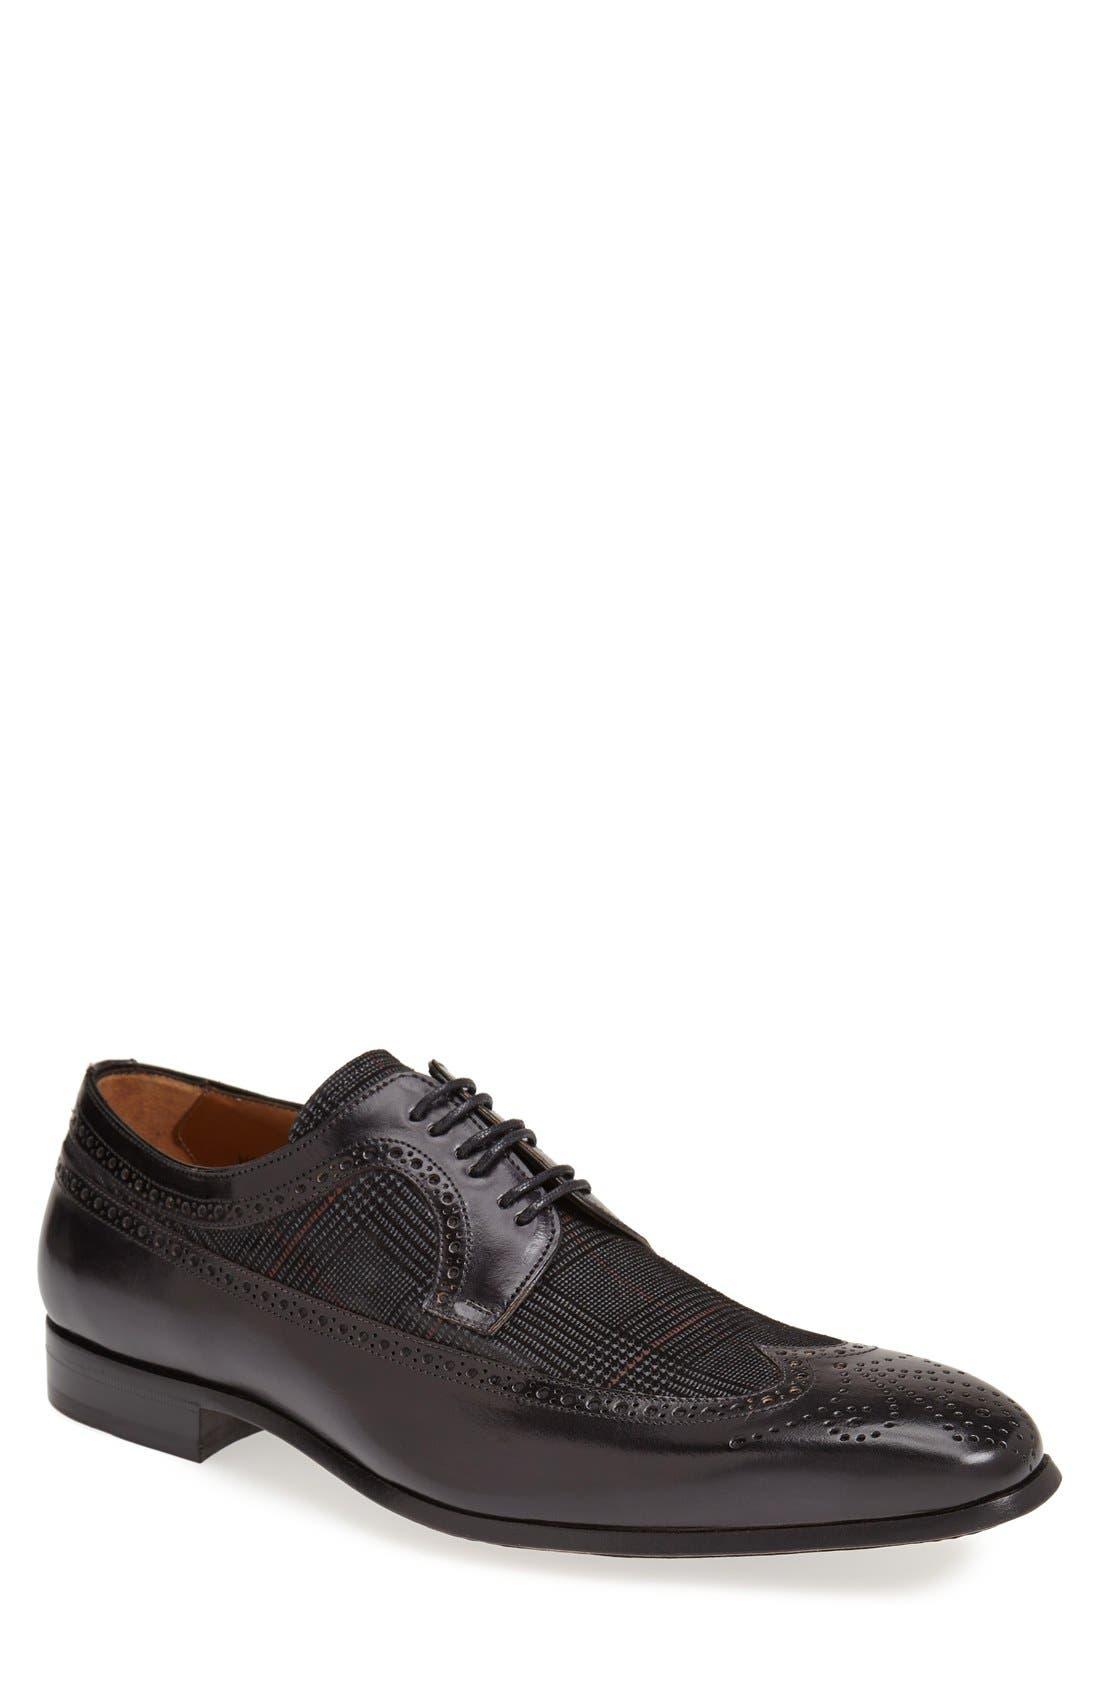 'Johann' Spectator Shoe,                         Main,                         color,